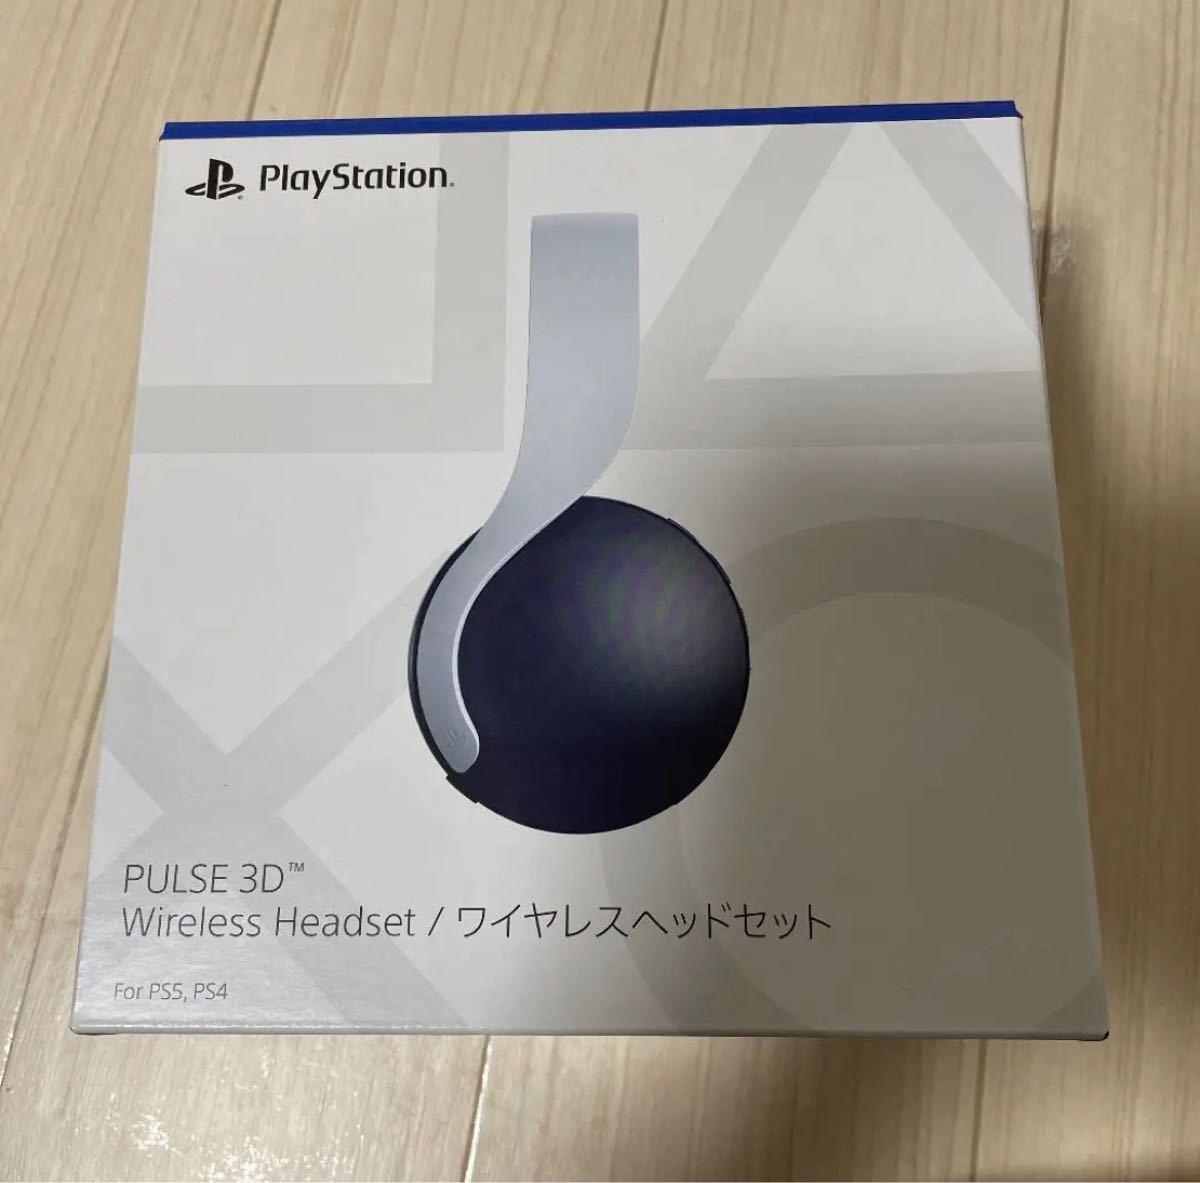 ps5 ワイヤレスヘッドセット PULSE 3D ps4プレイステーション5 ヘッドセット